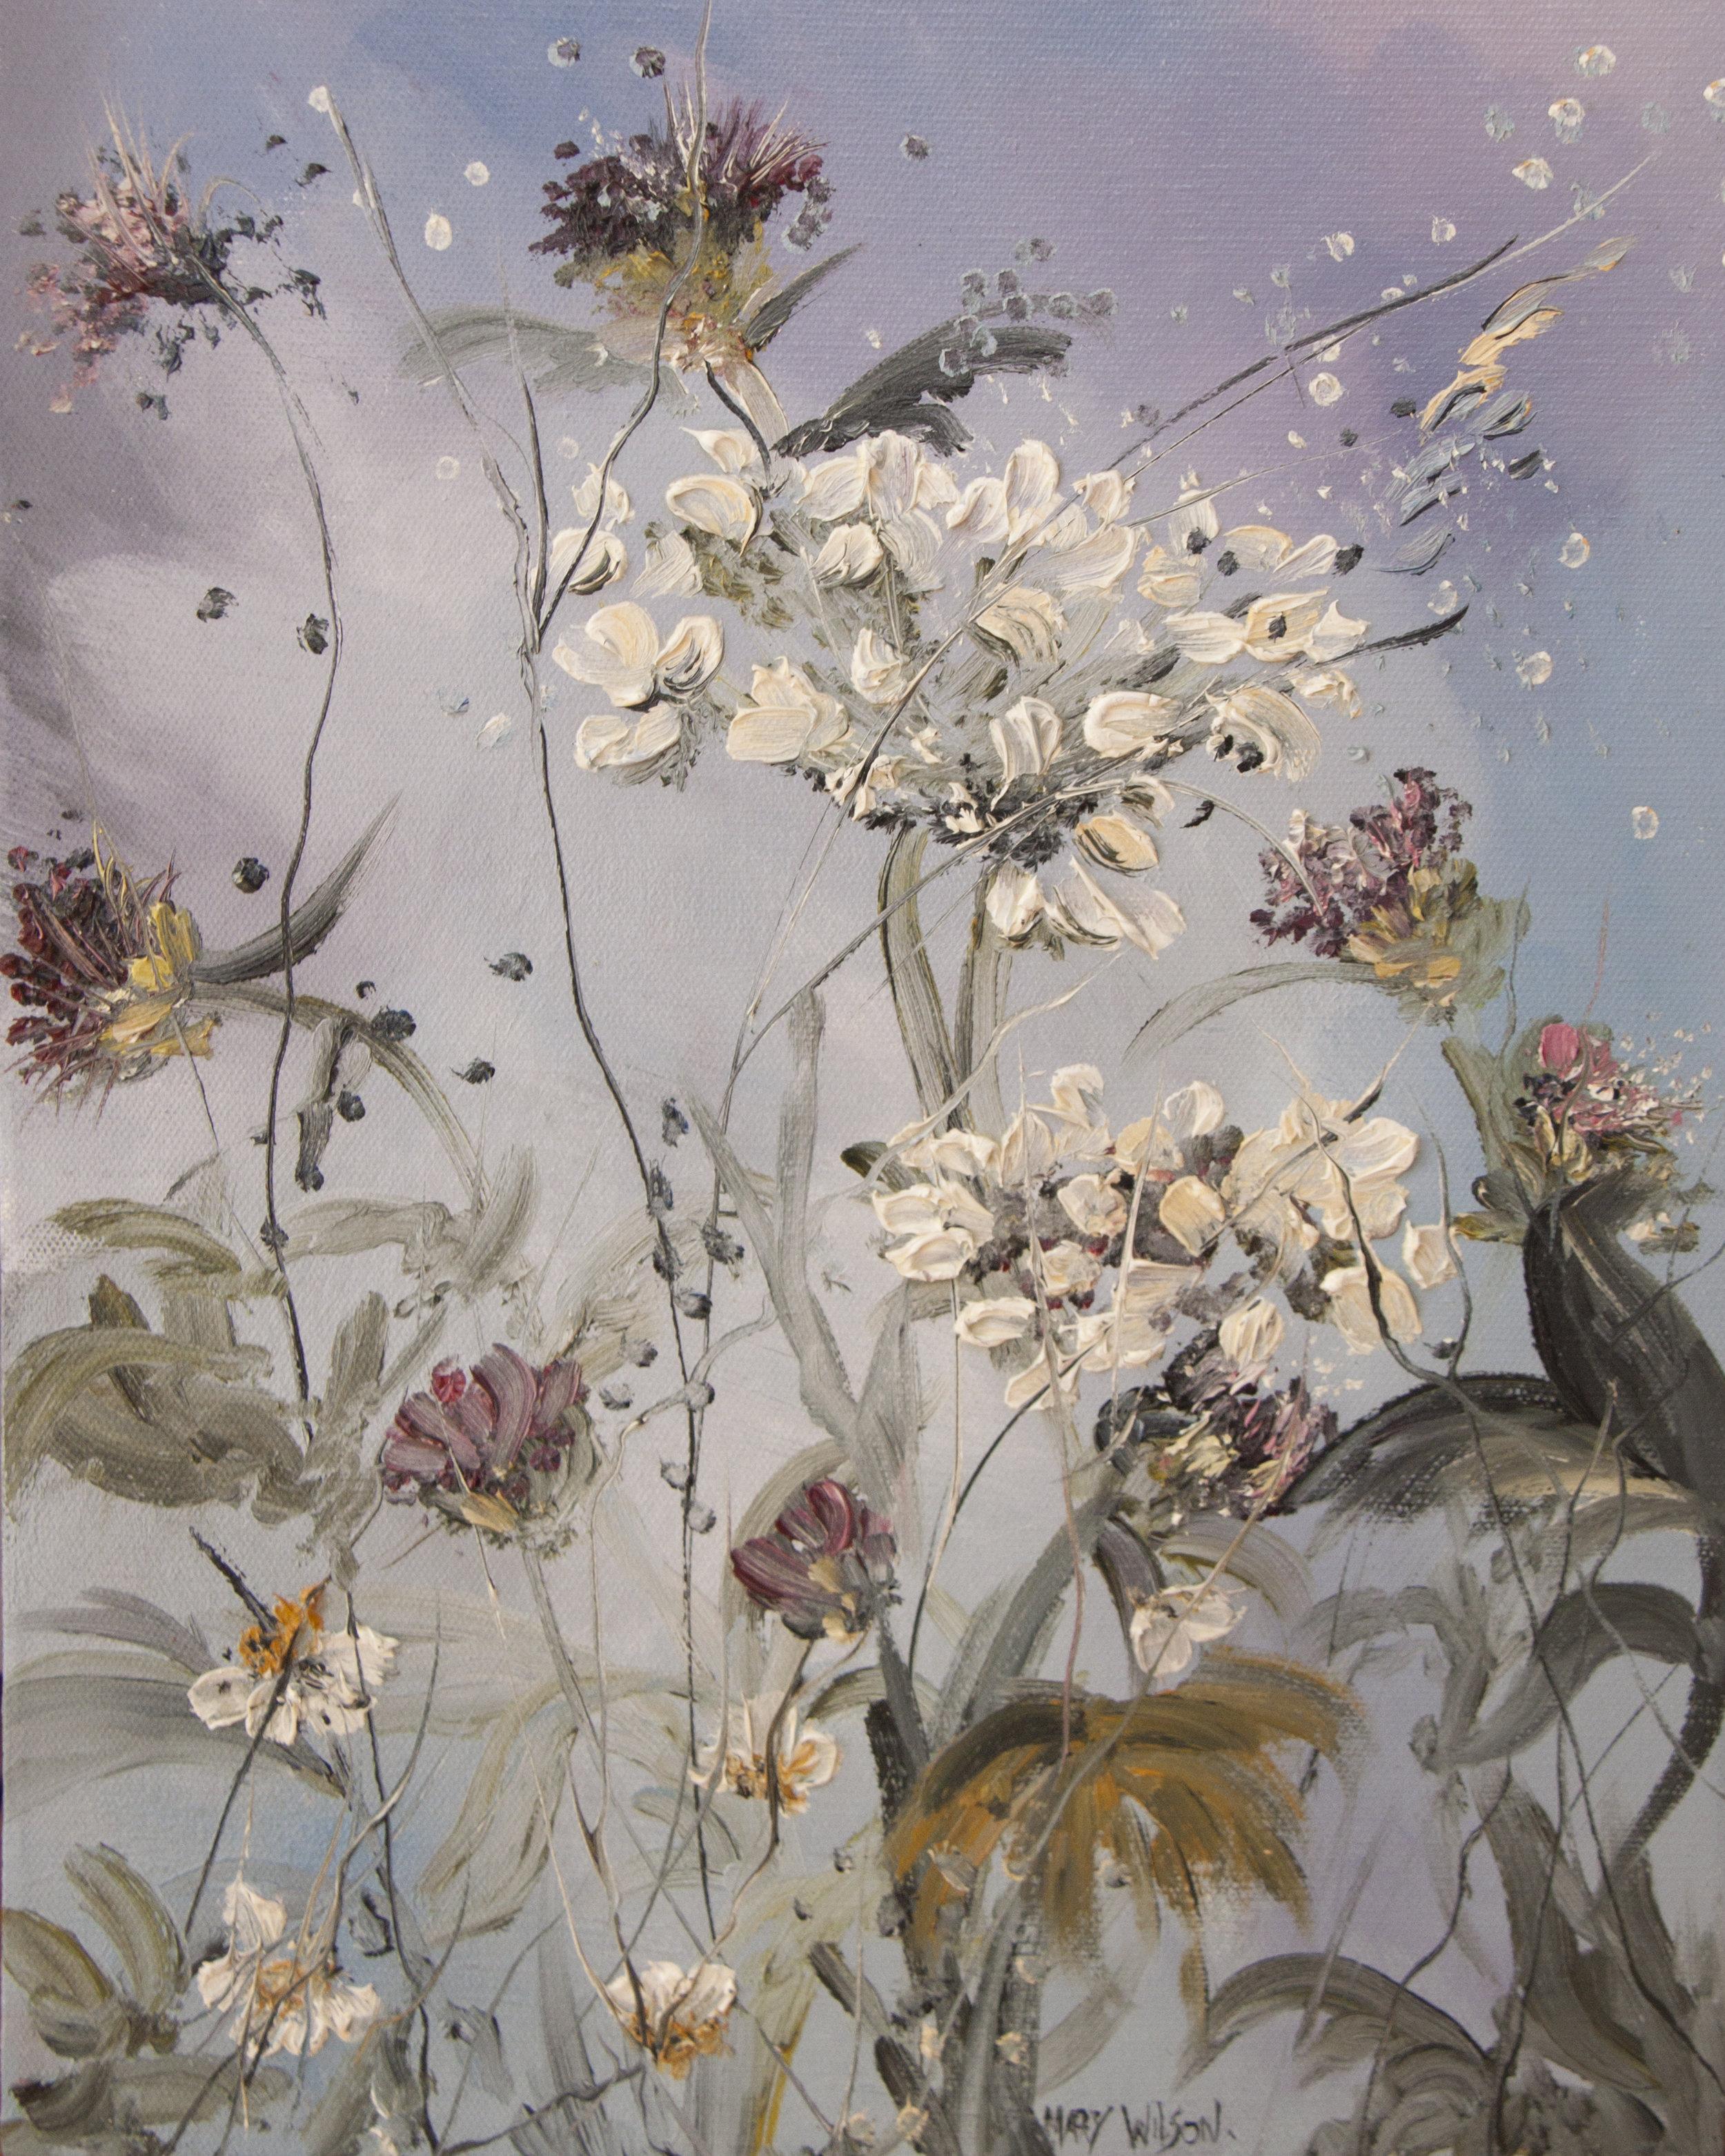 'Wild Blooms' by artist Mary Wilson.jpg